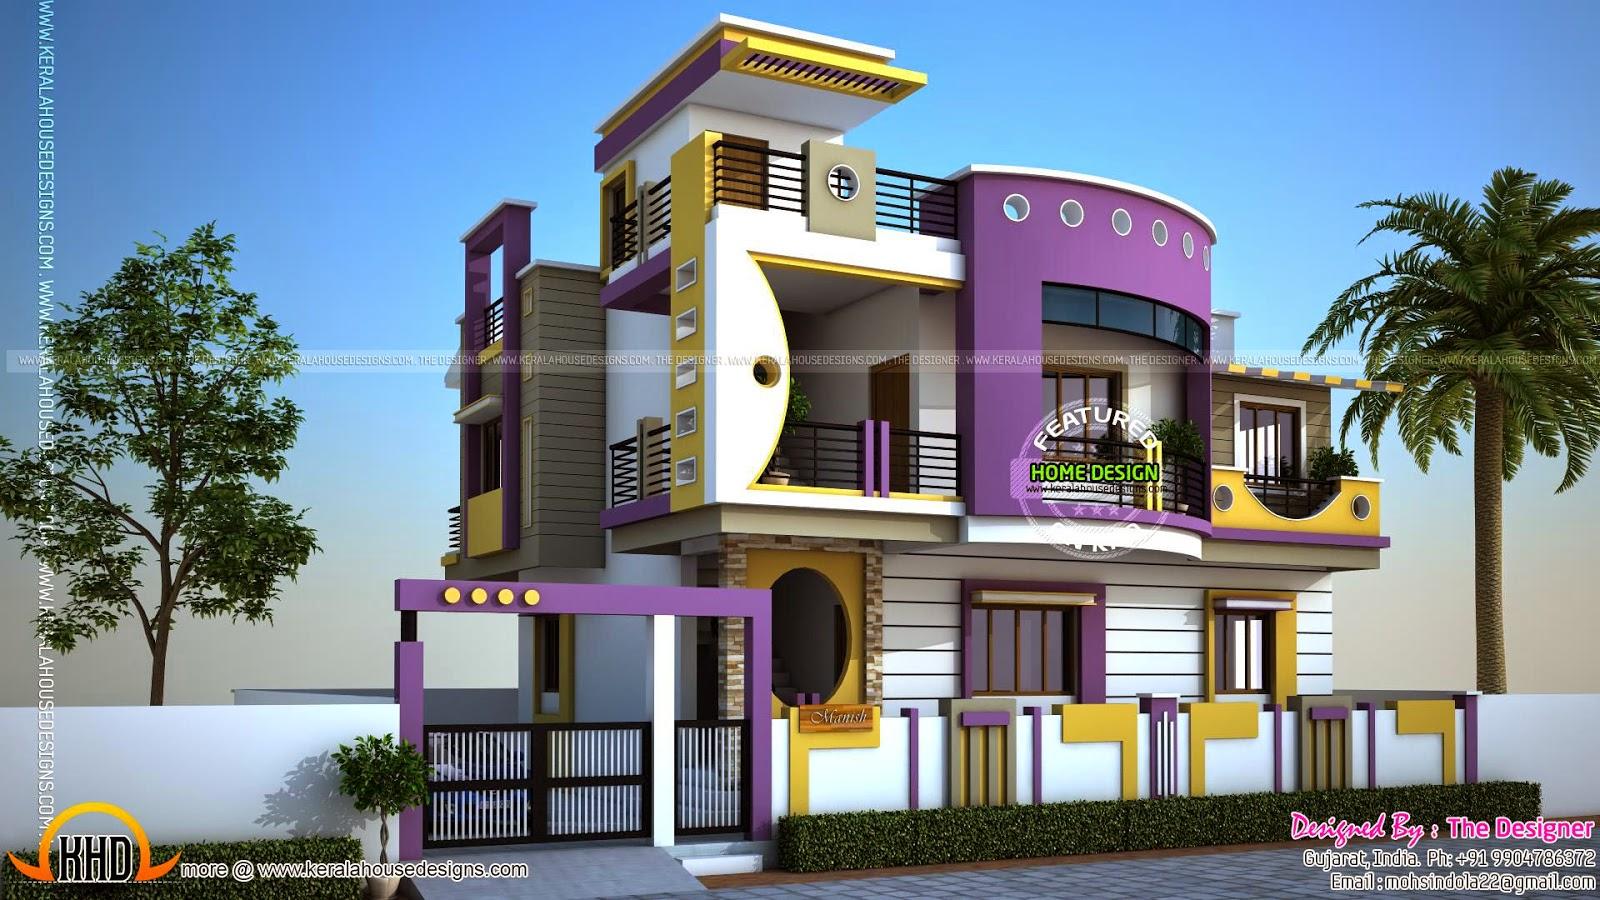 Home Design In India - Home Design Ideas